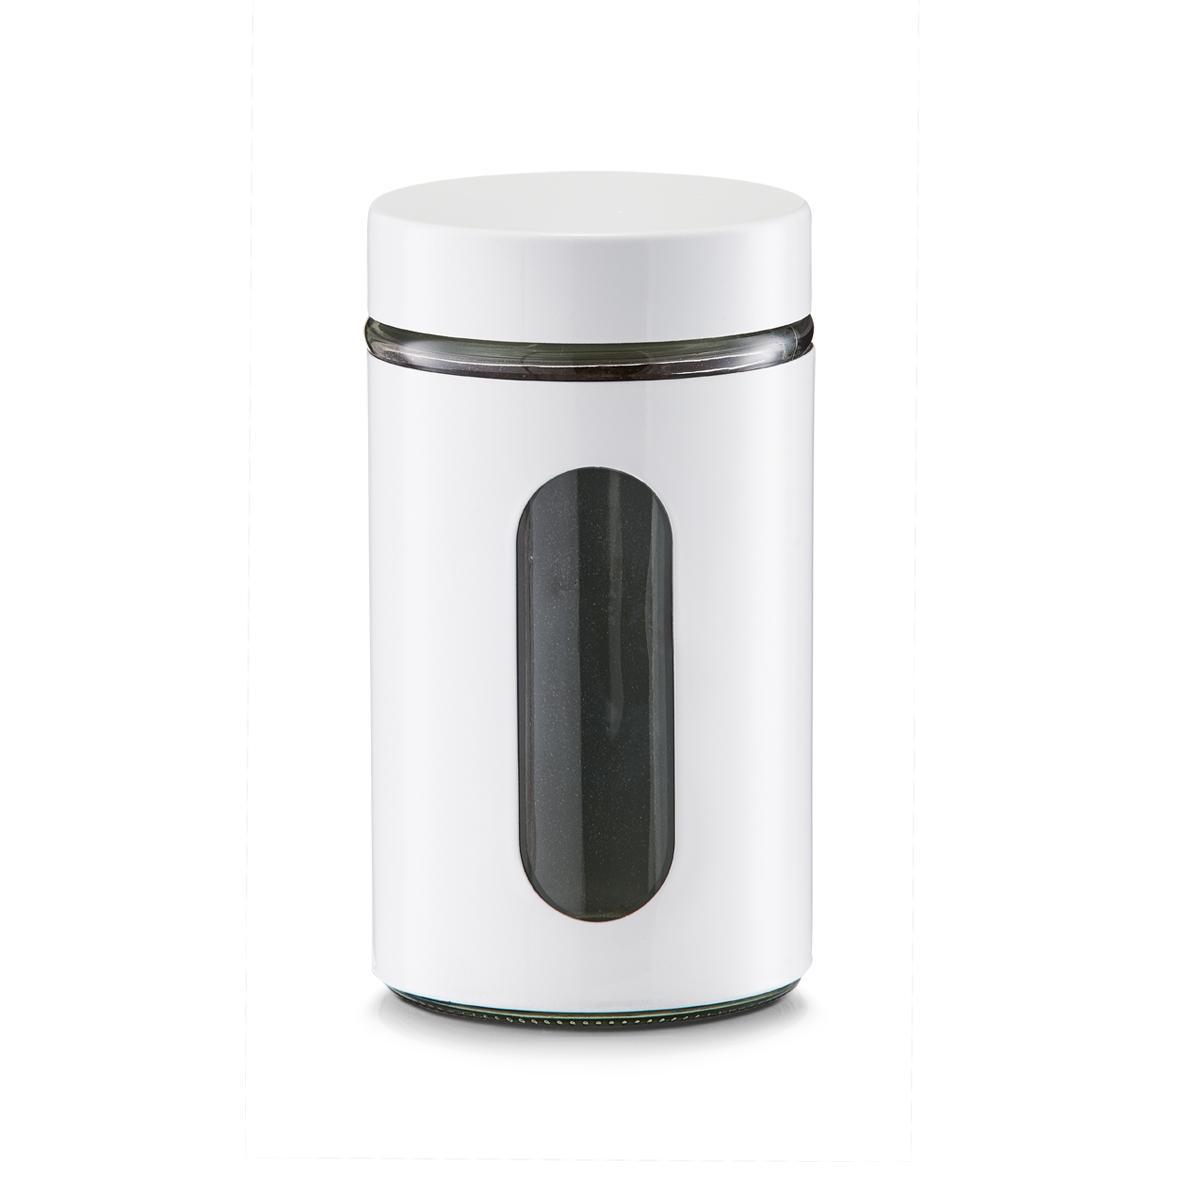 Recipient pentru depozitare Visual, metal si sticla, White 900 ml, Ø 10,2xH18 cm poza